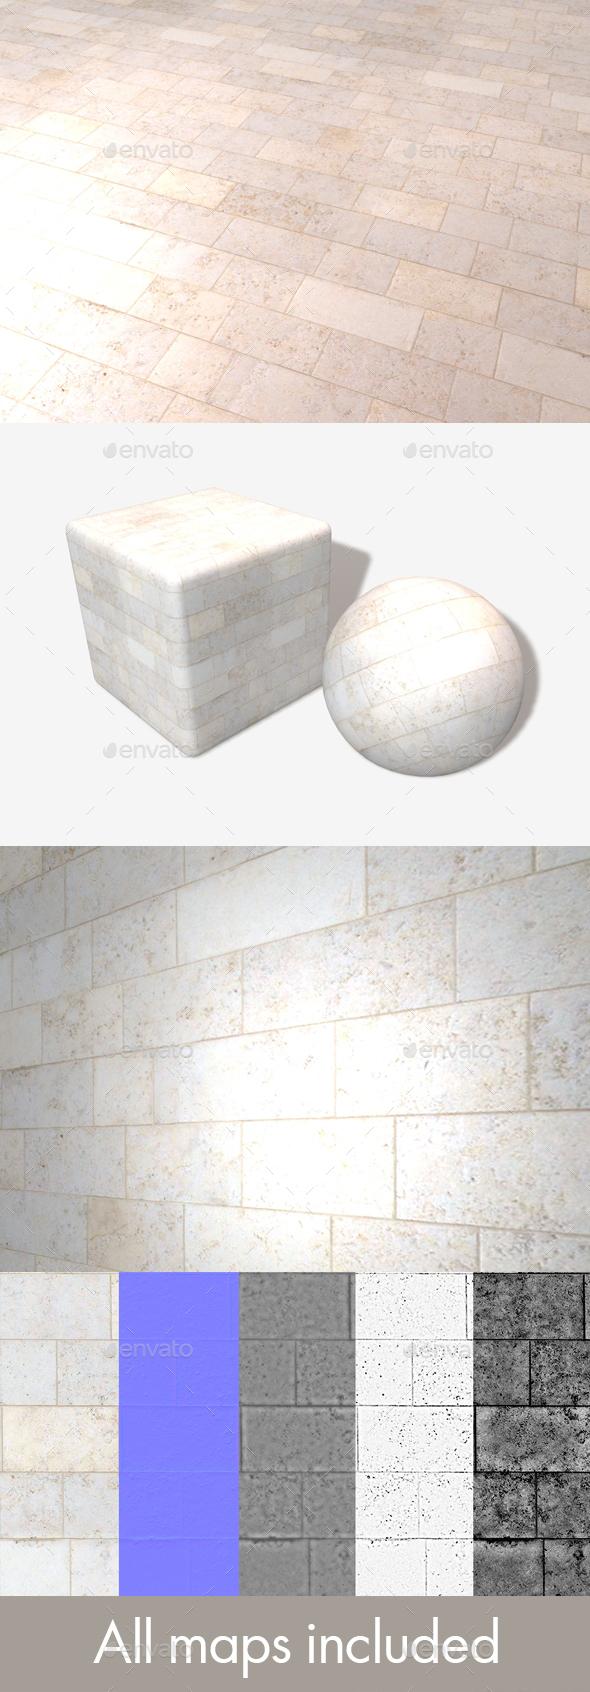 Marble Bricks Seamless Texture - 3DOcean Item for Sale